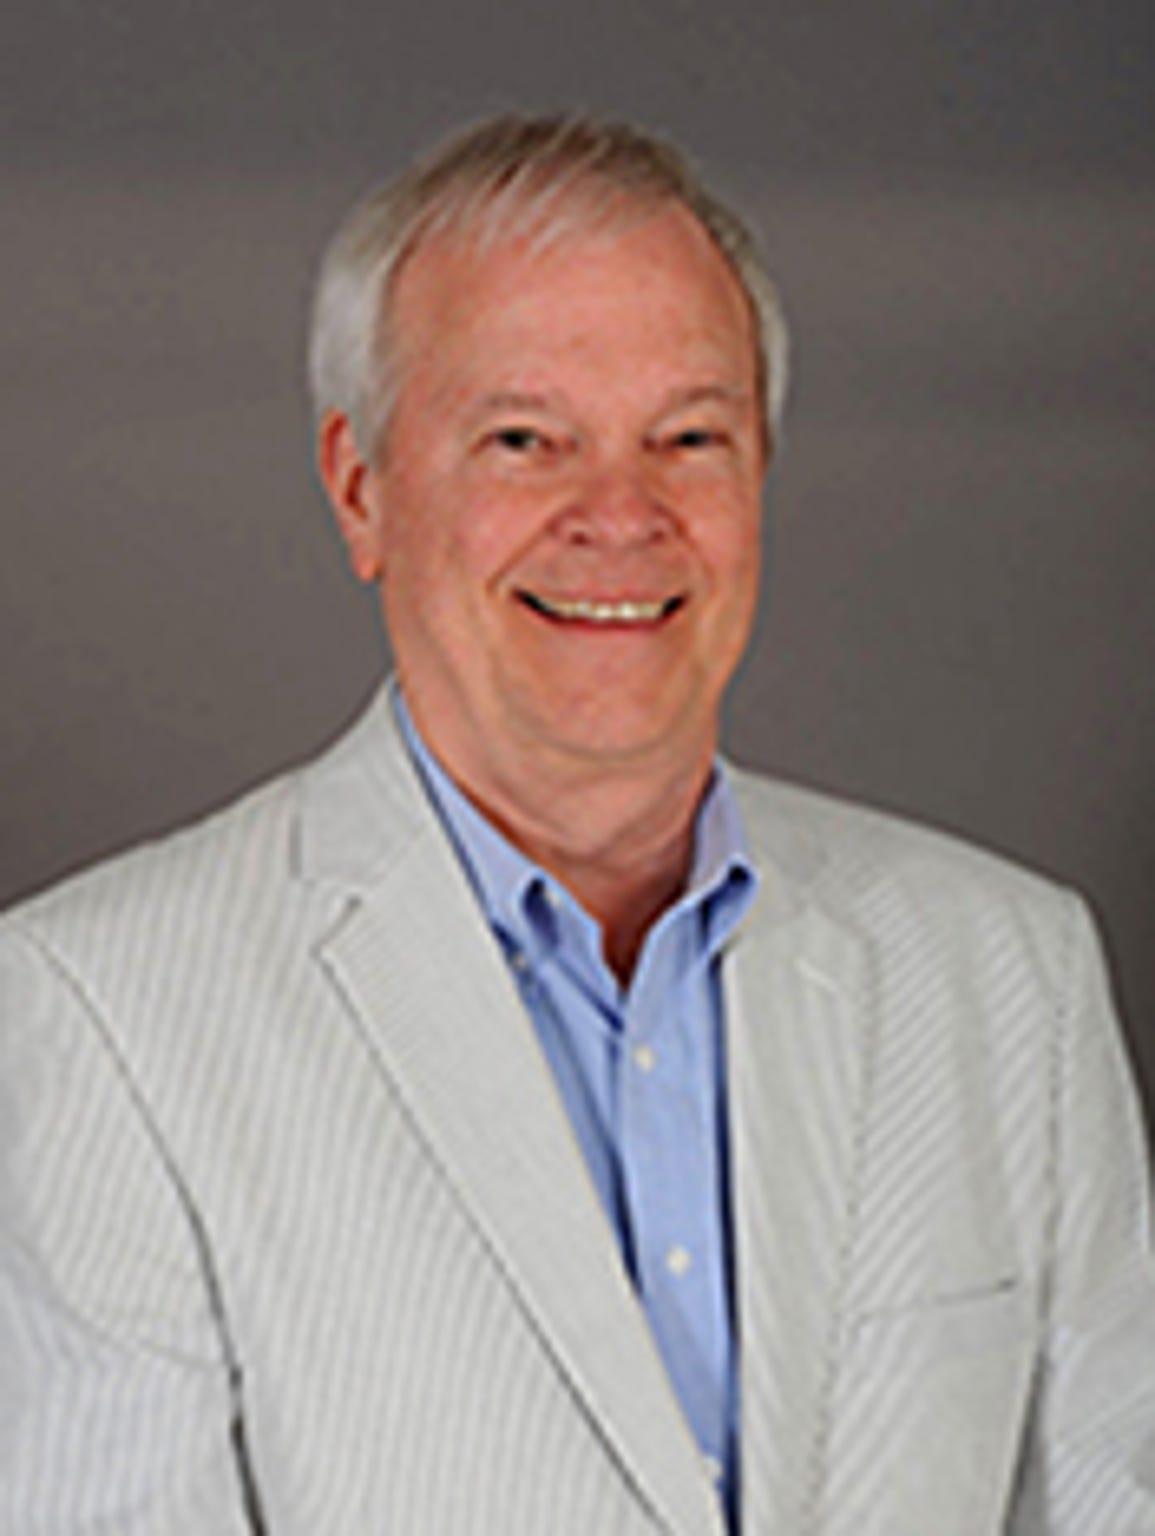 Bristol, Virginia, Mayor Archie Hubbard